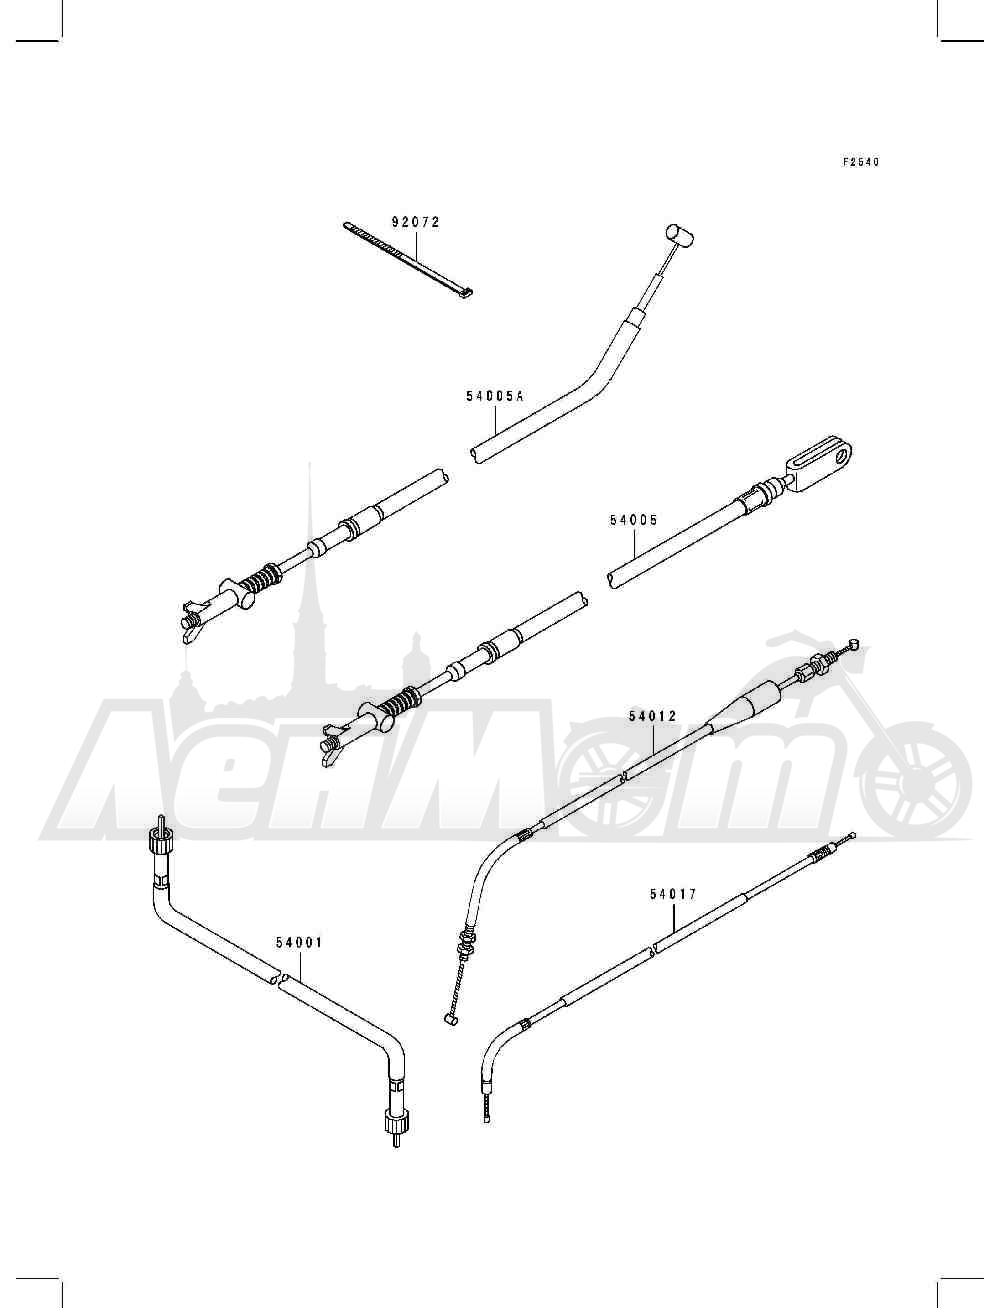 Запчасти для Квадроцикла Kawasaki 1994 BAYOU 400 4X4 (KLF400-B2) Раздел: CABLES | тросики, кабели